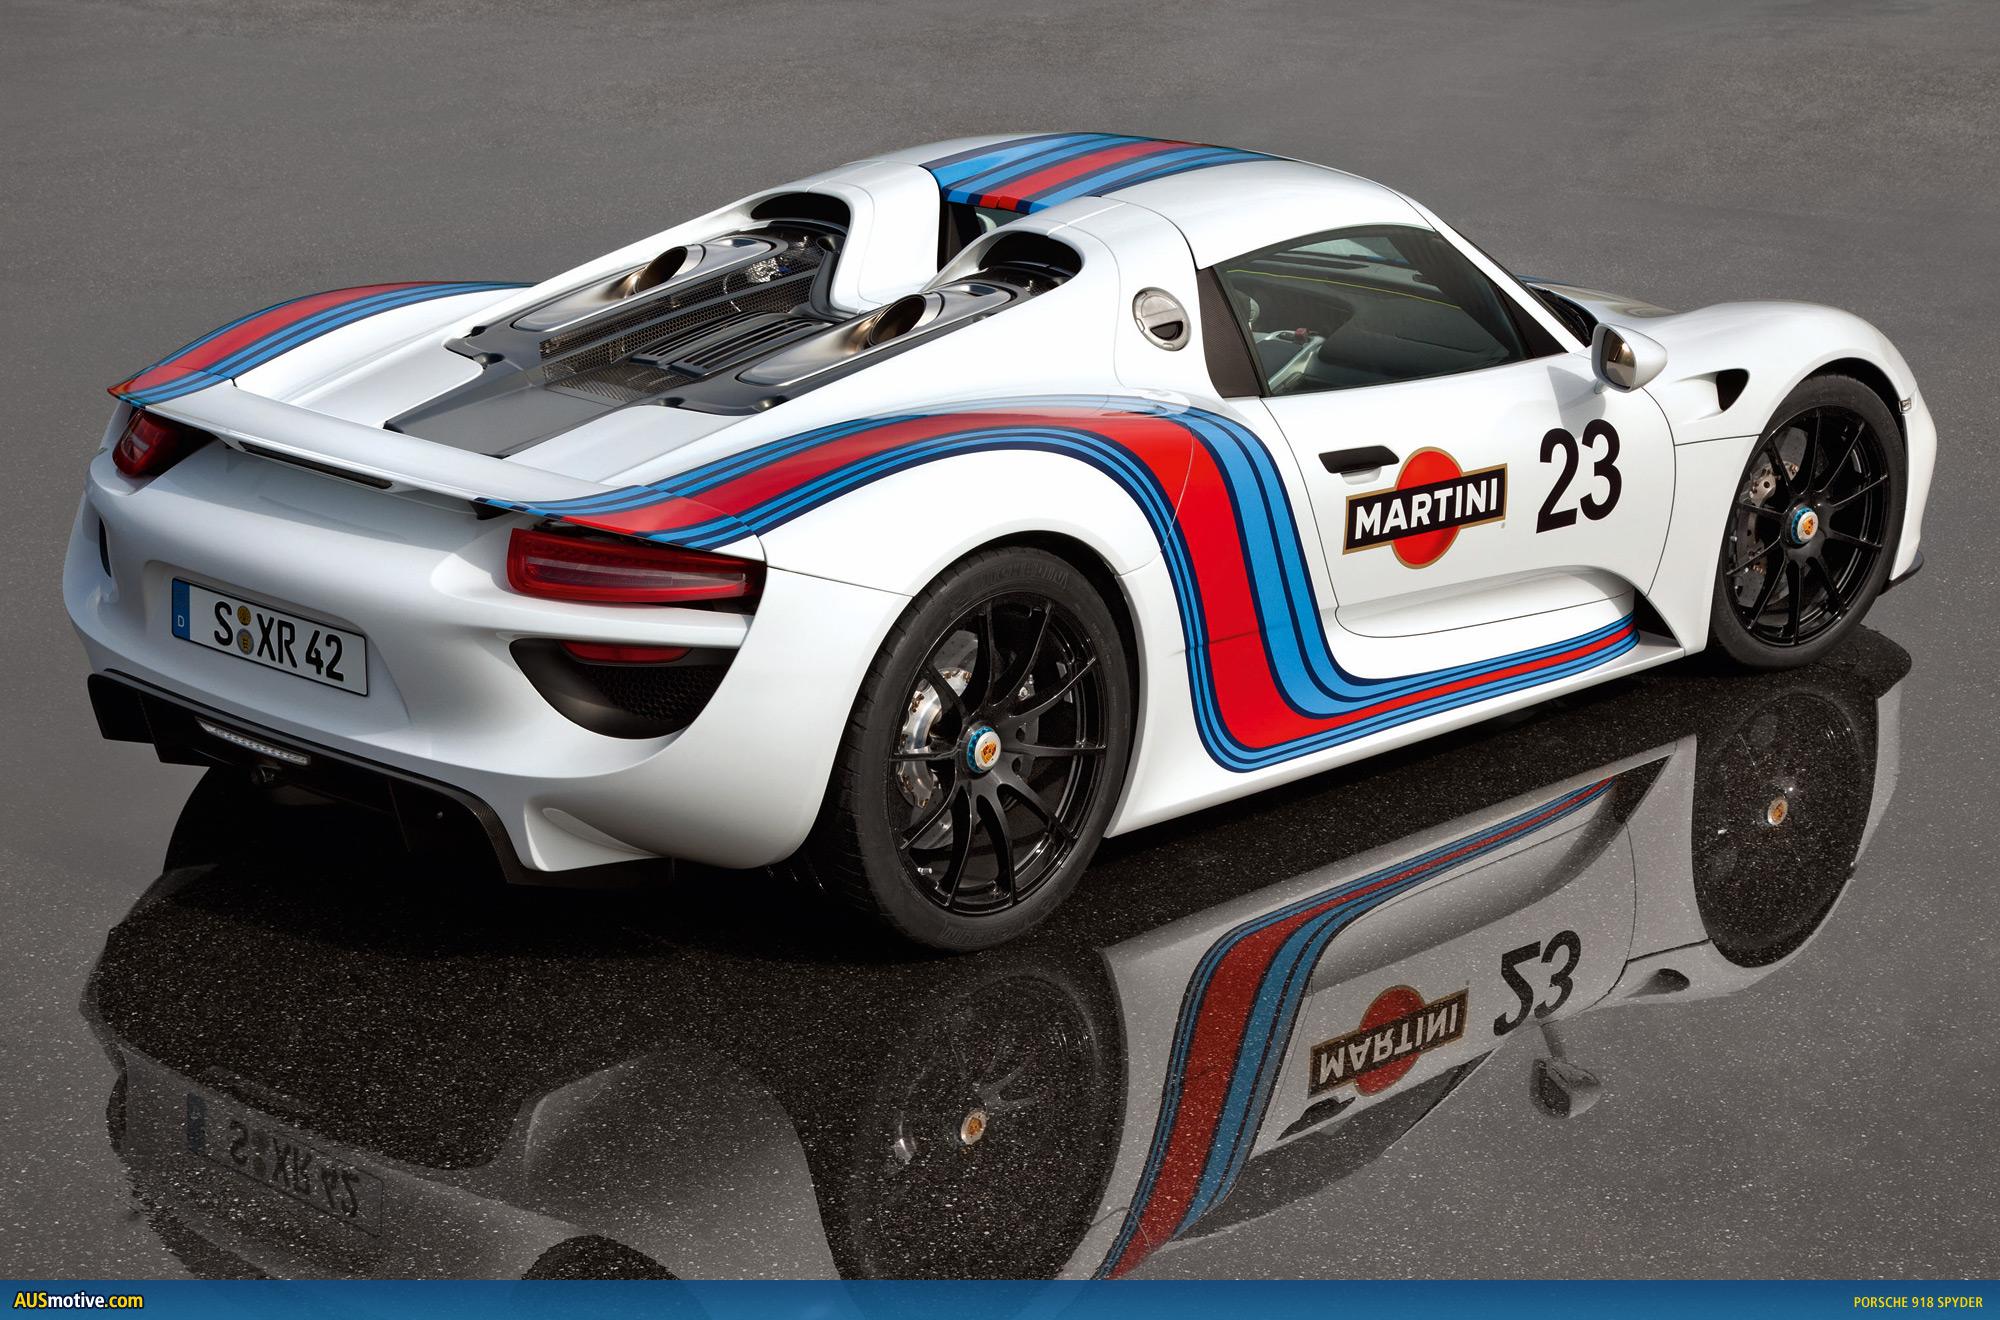 Porsche-918-Spyder-Martini-05 Marvelous Porsche 918 Spyder Hybrid Prezzo Cars Trend